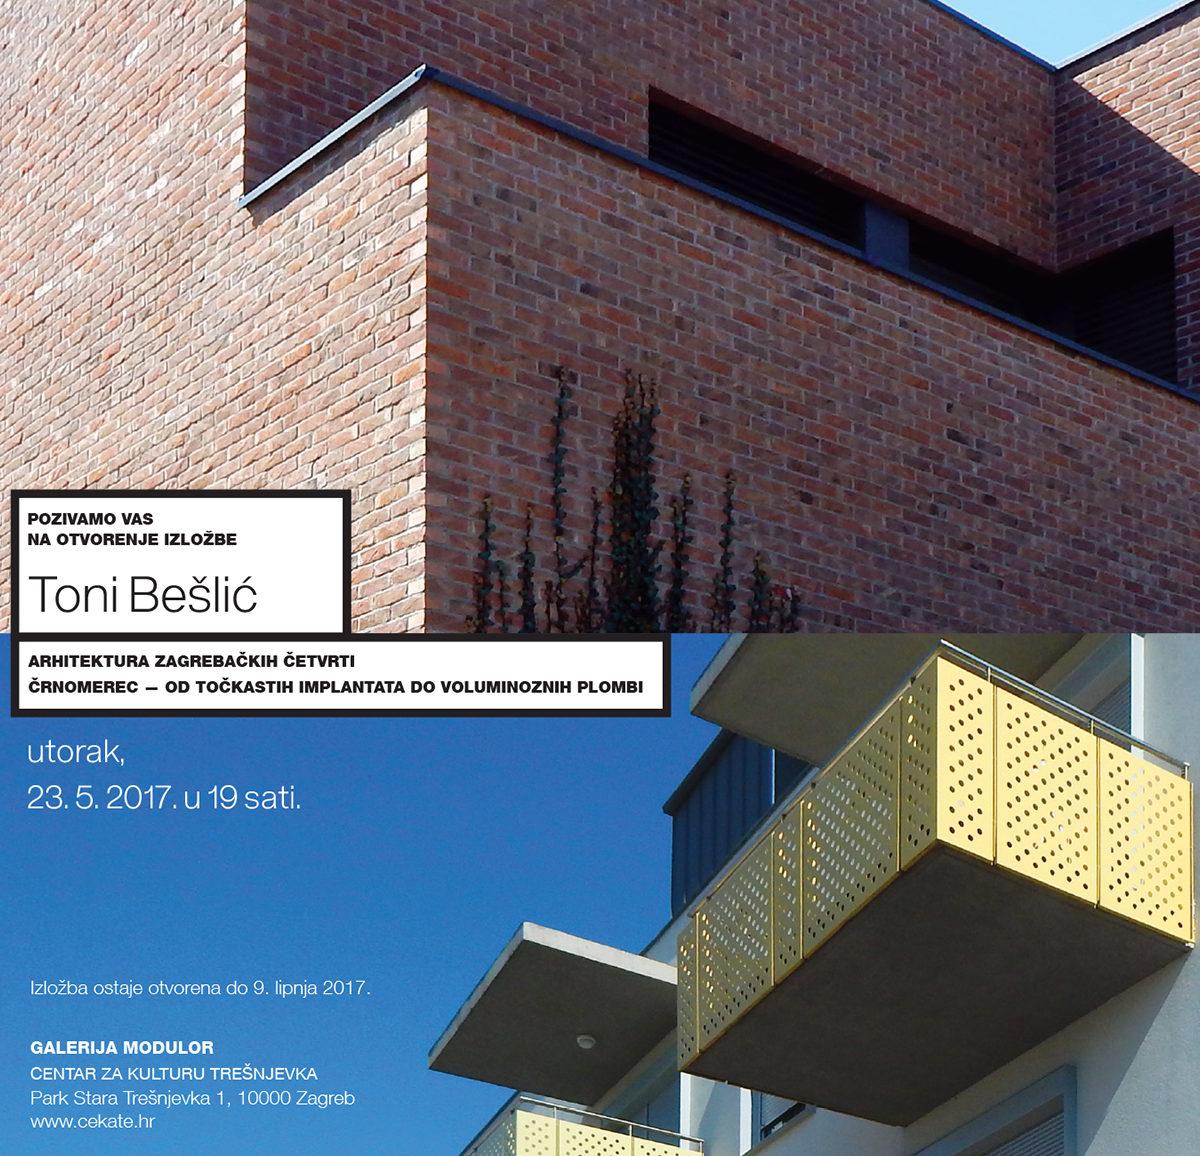 Arhitektura zagrebačkih četvrti: Črnomerec-od točkastih implantata do voluminoznih plombi